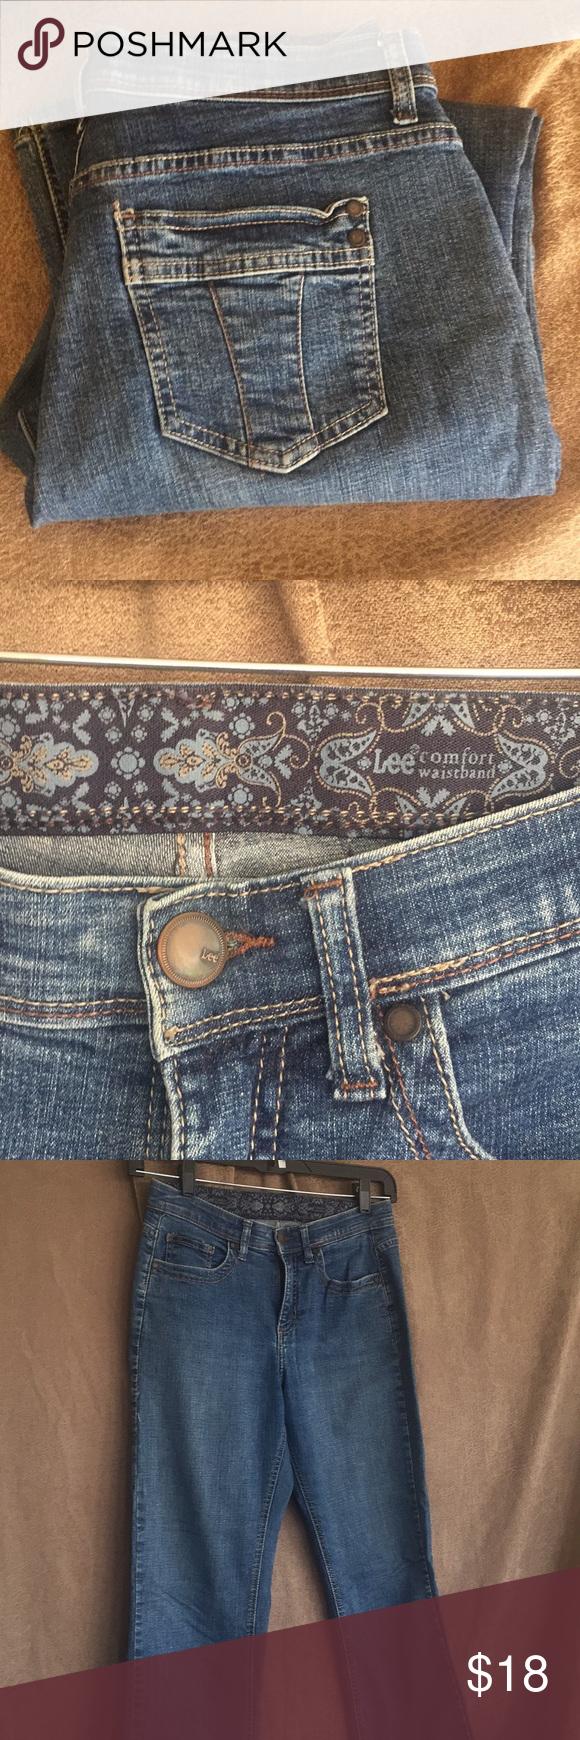 waist cargo size lee waistband s shorts flex series comforter performance comfort ebay p extreme khaki